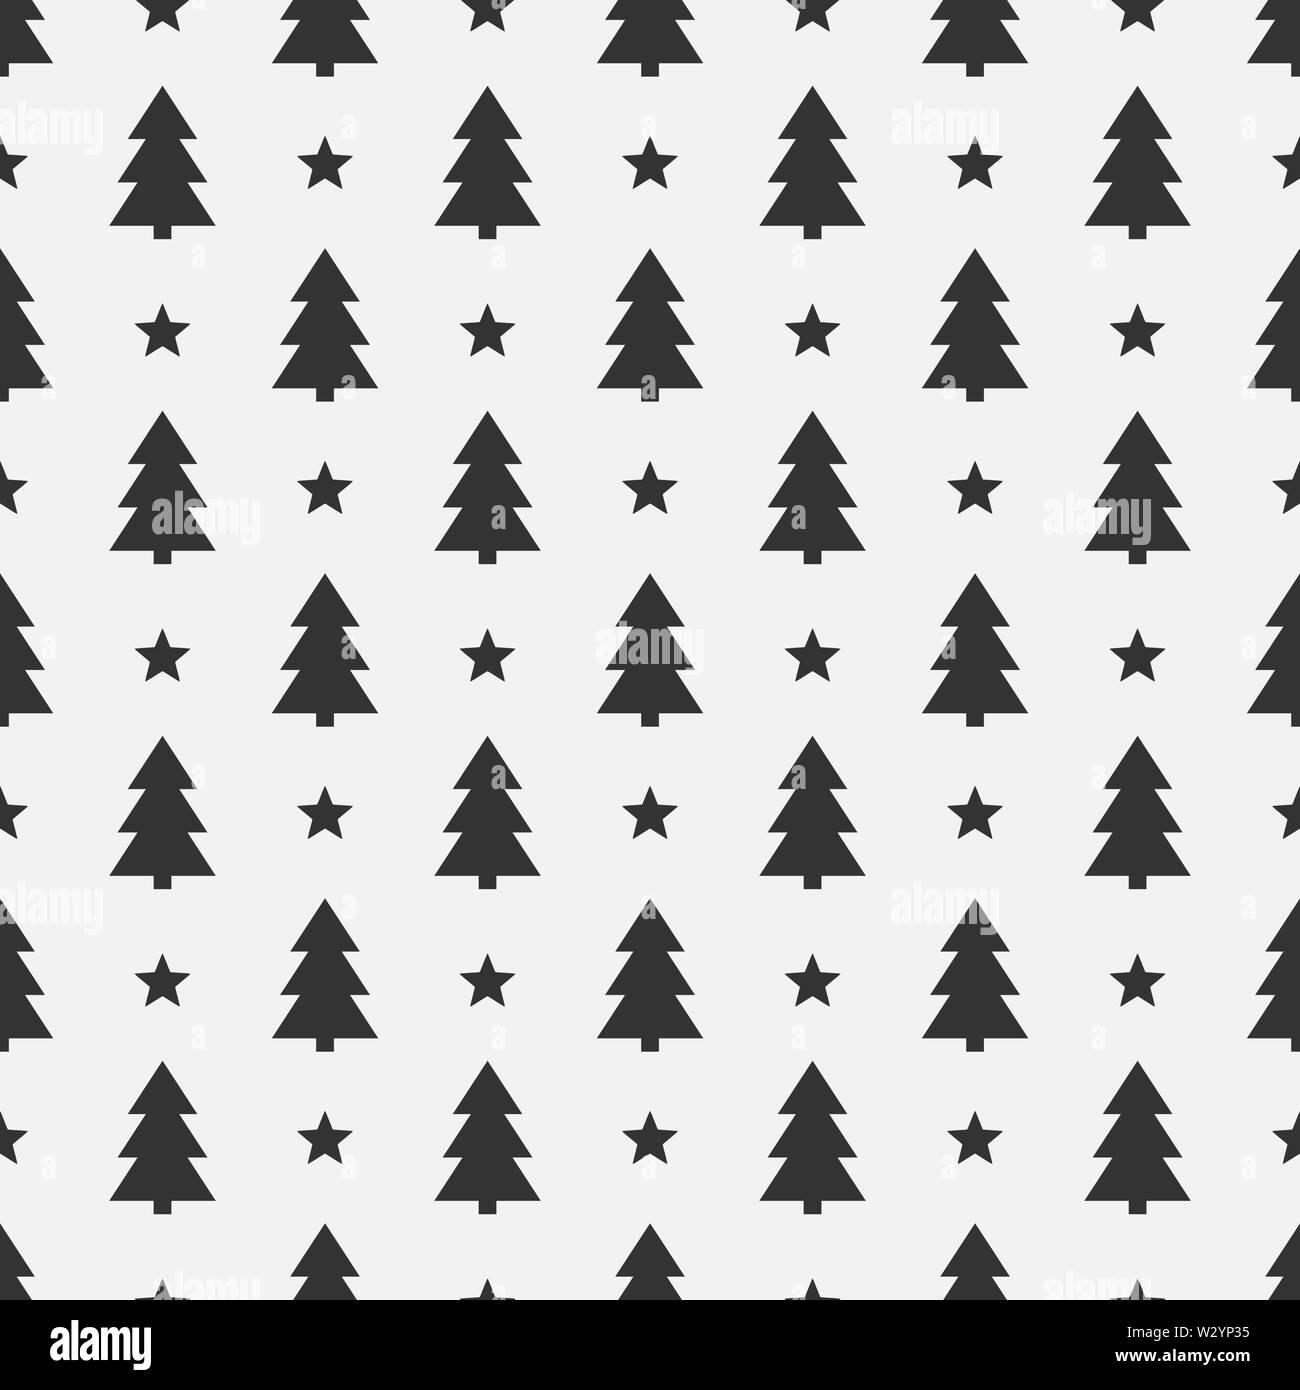 Christmas trees black seamless pattern. Vector illustration. - Stock Image